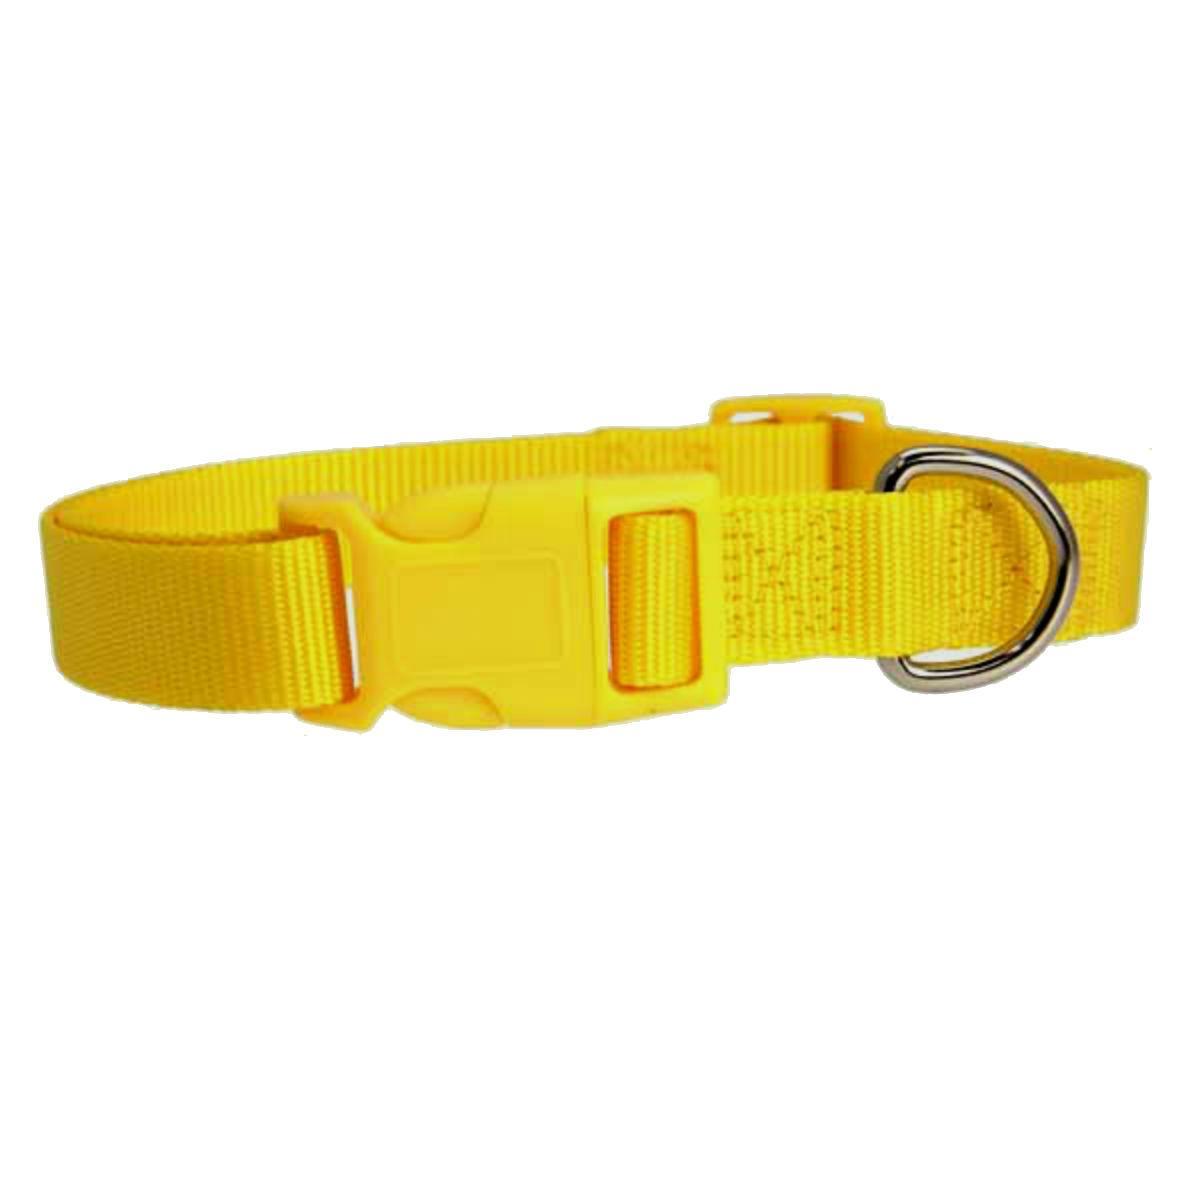 Casual Canine Nylon Dog Collar - Yellow